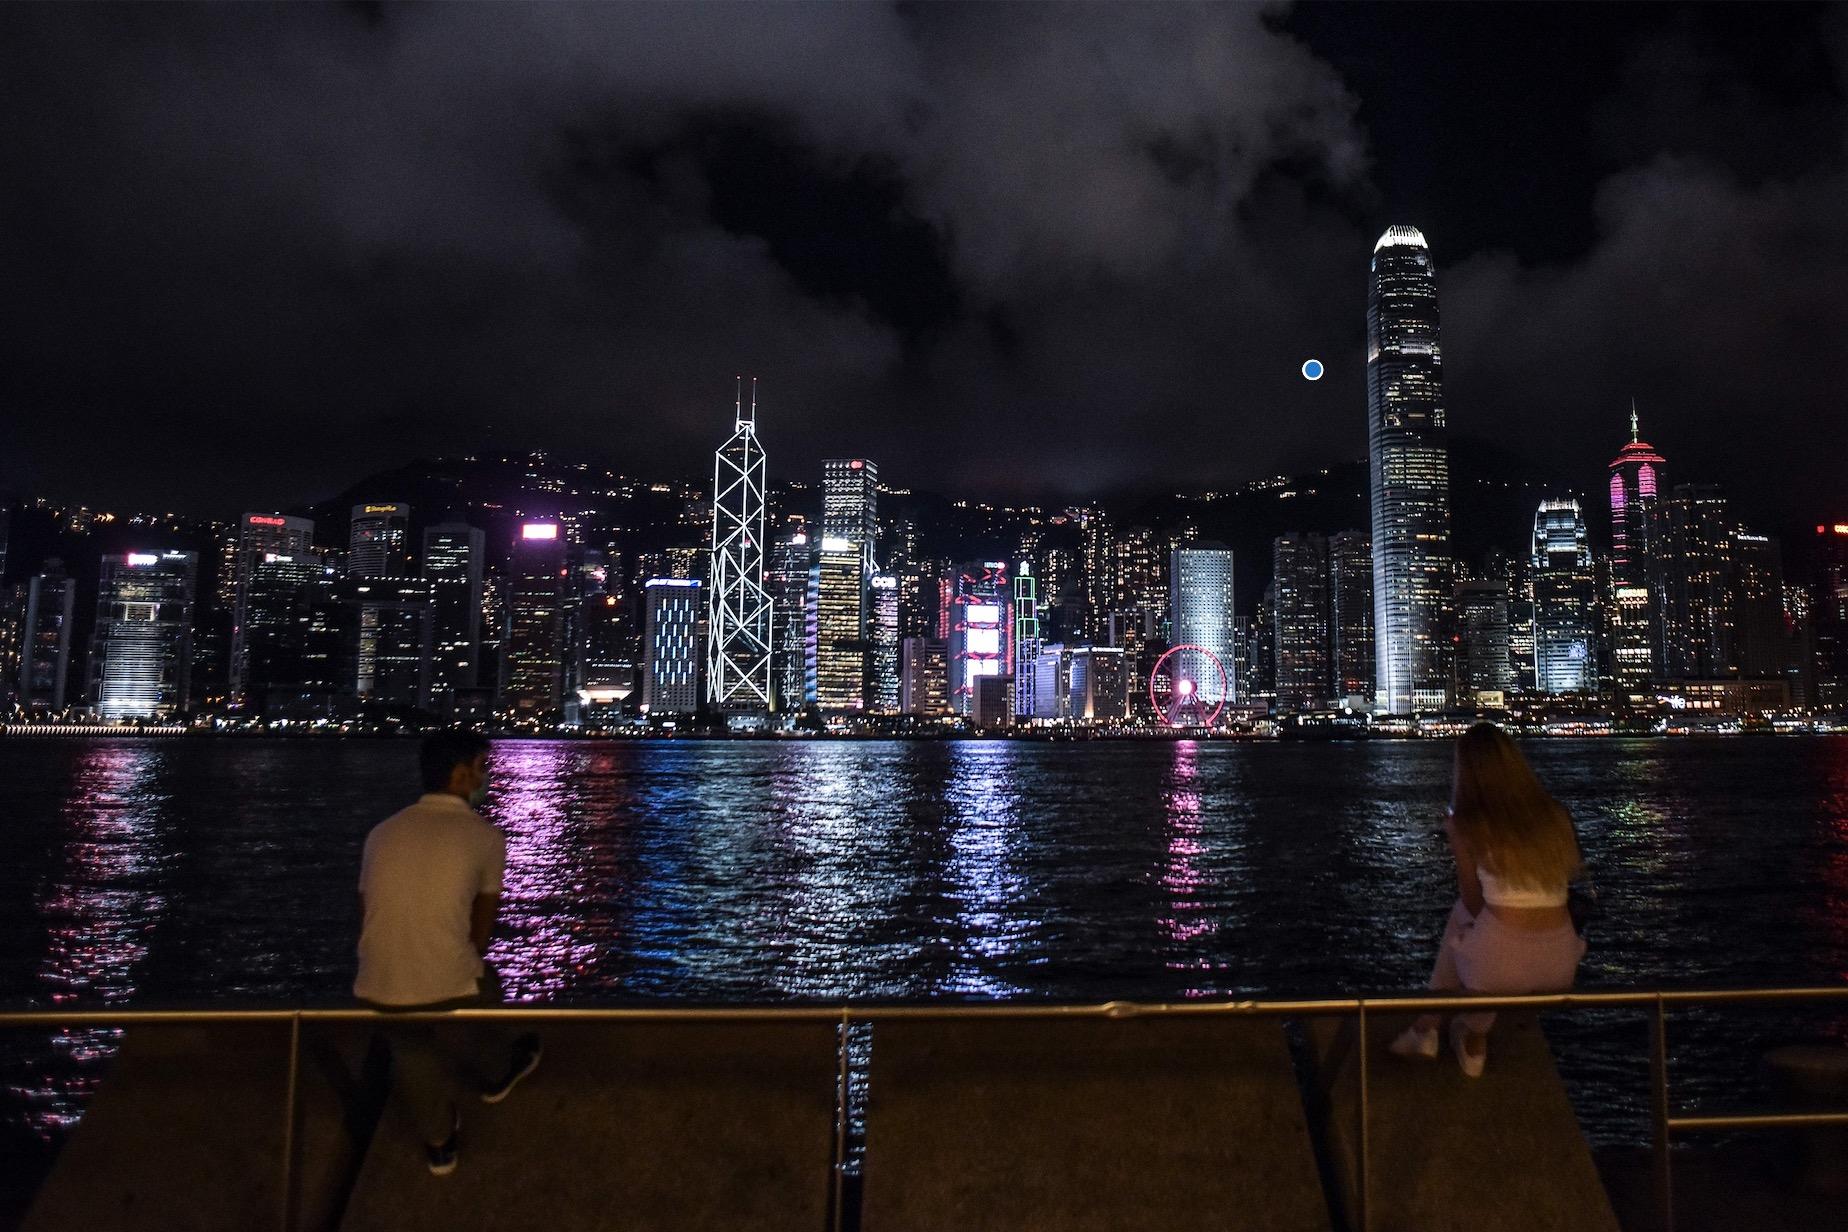 Hong Kong Richard Brooks/Getty Images